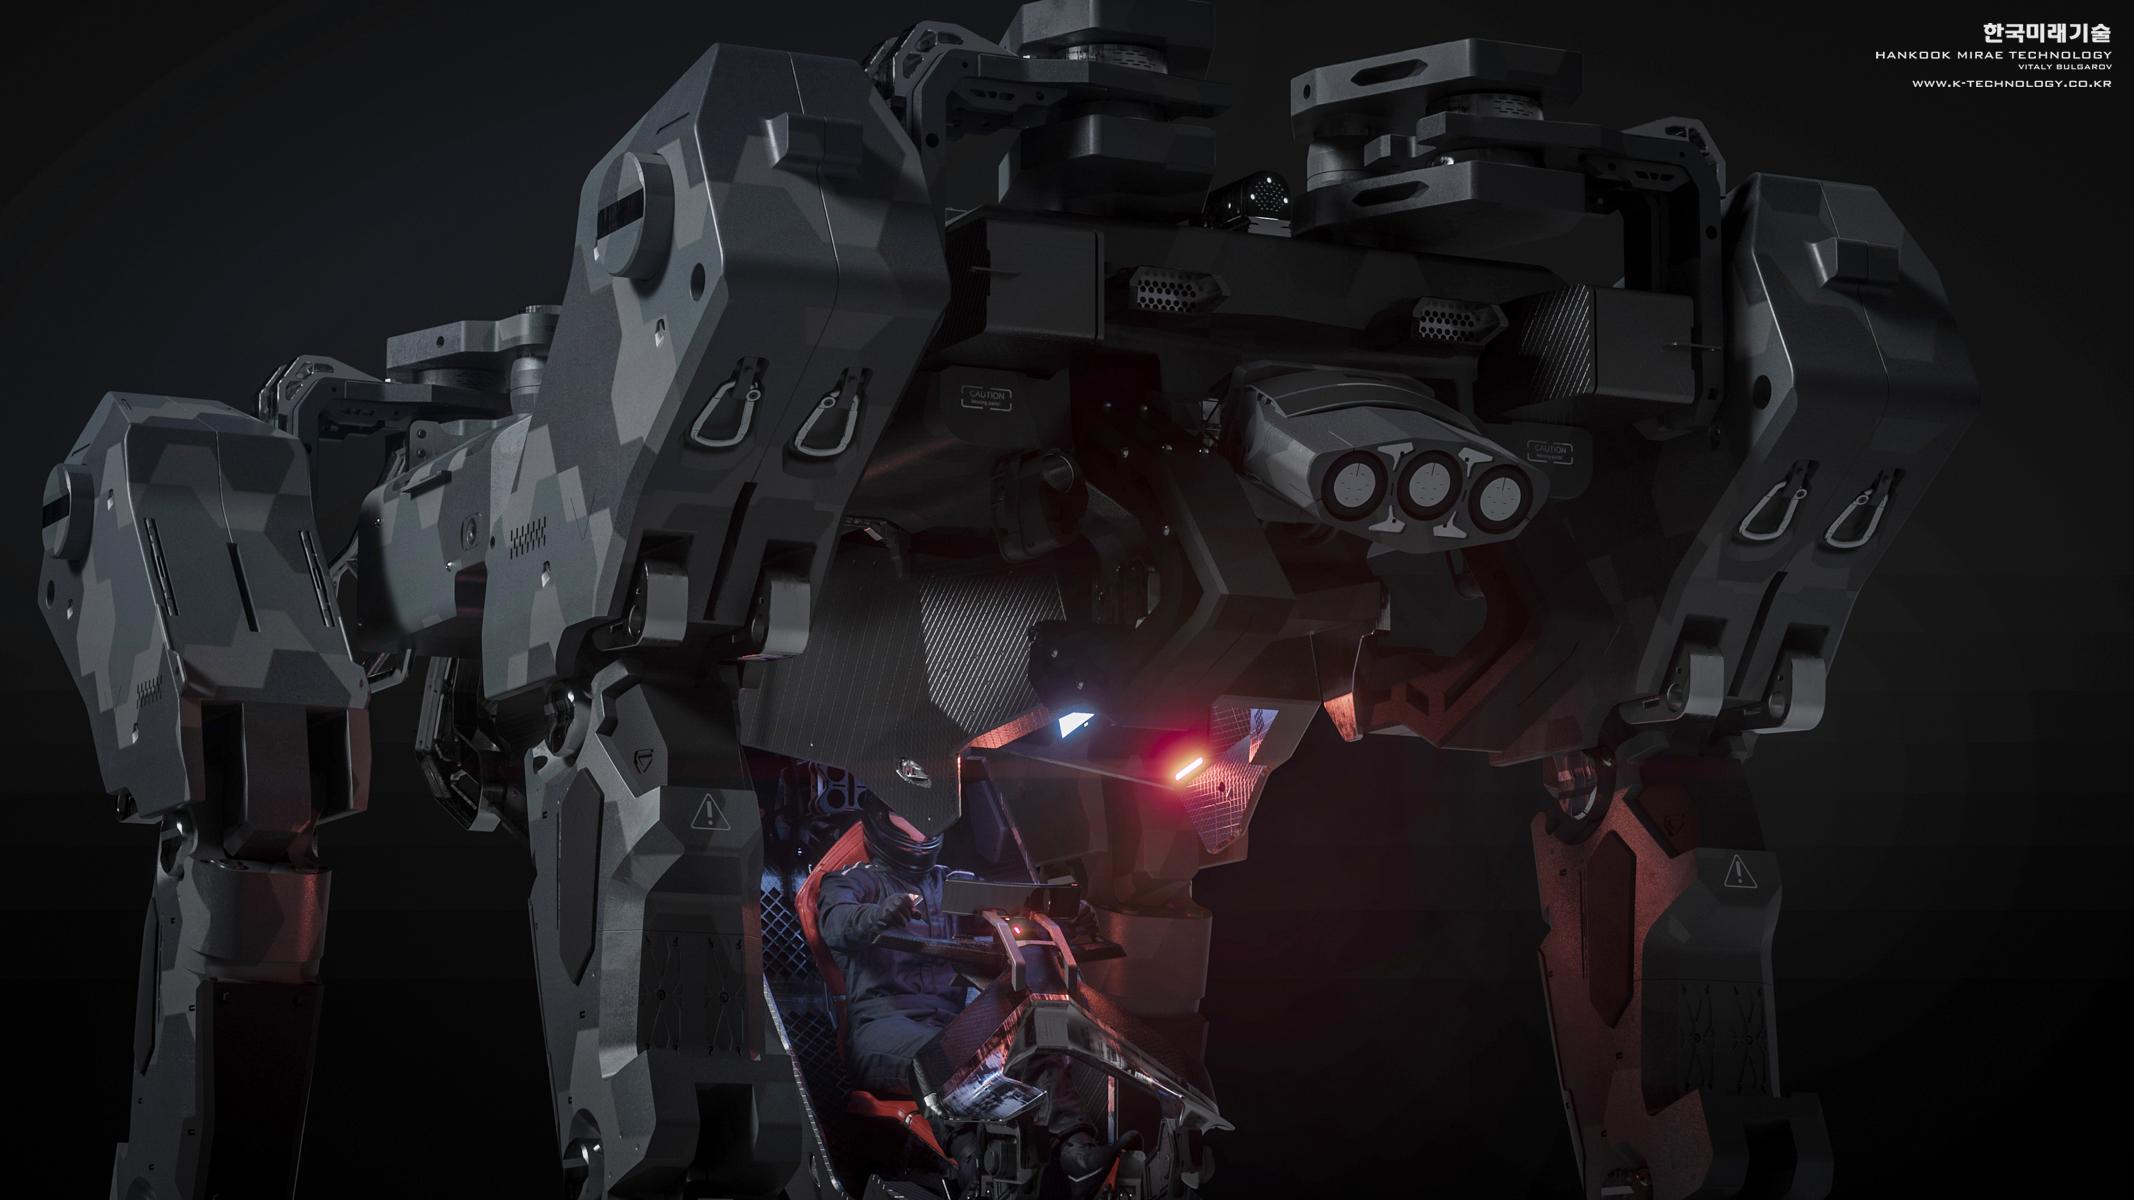 KFT_4LeggedRobot_FullView_DarkCamo_03.jpg